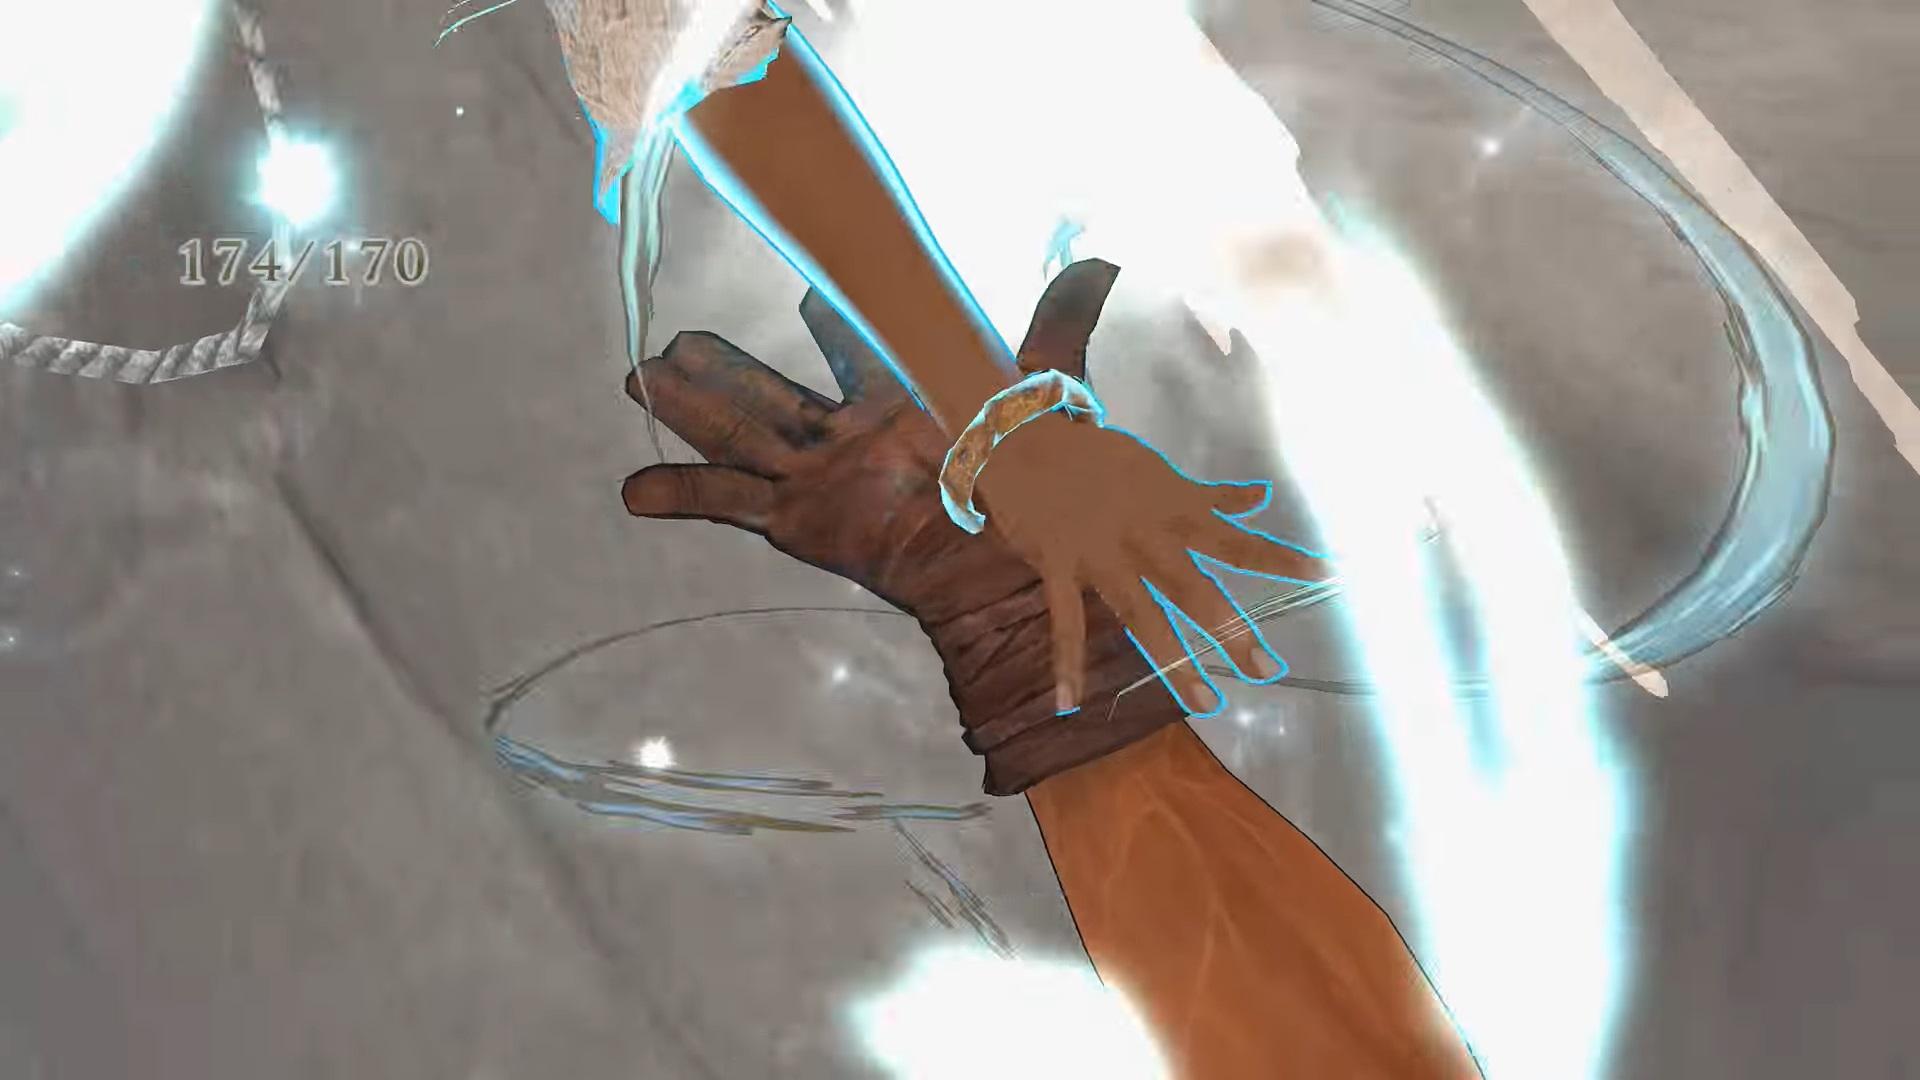 Prince of Persia hand.jpg